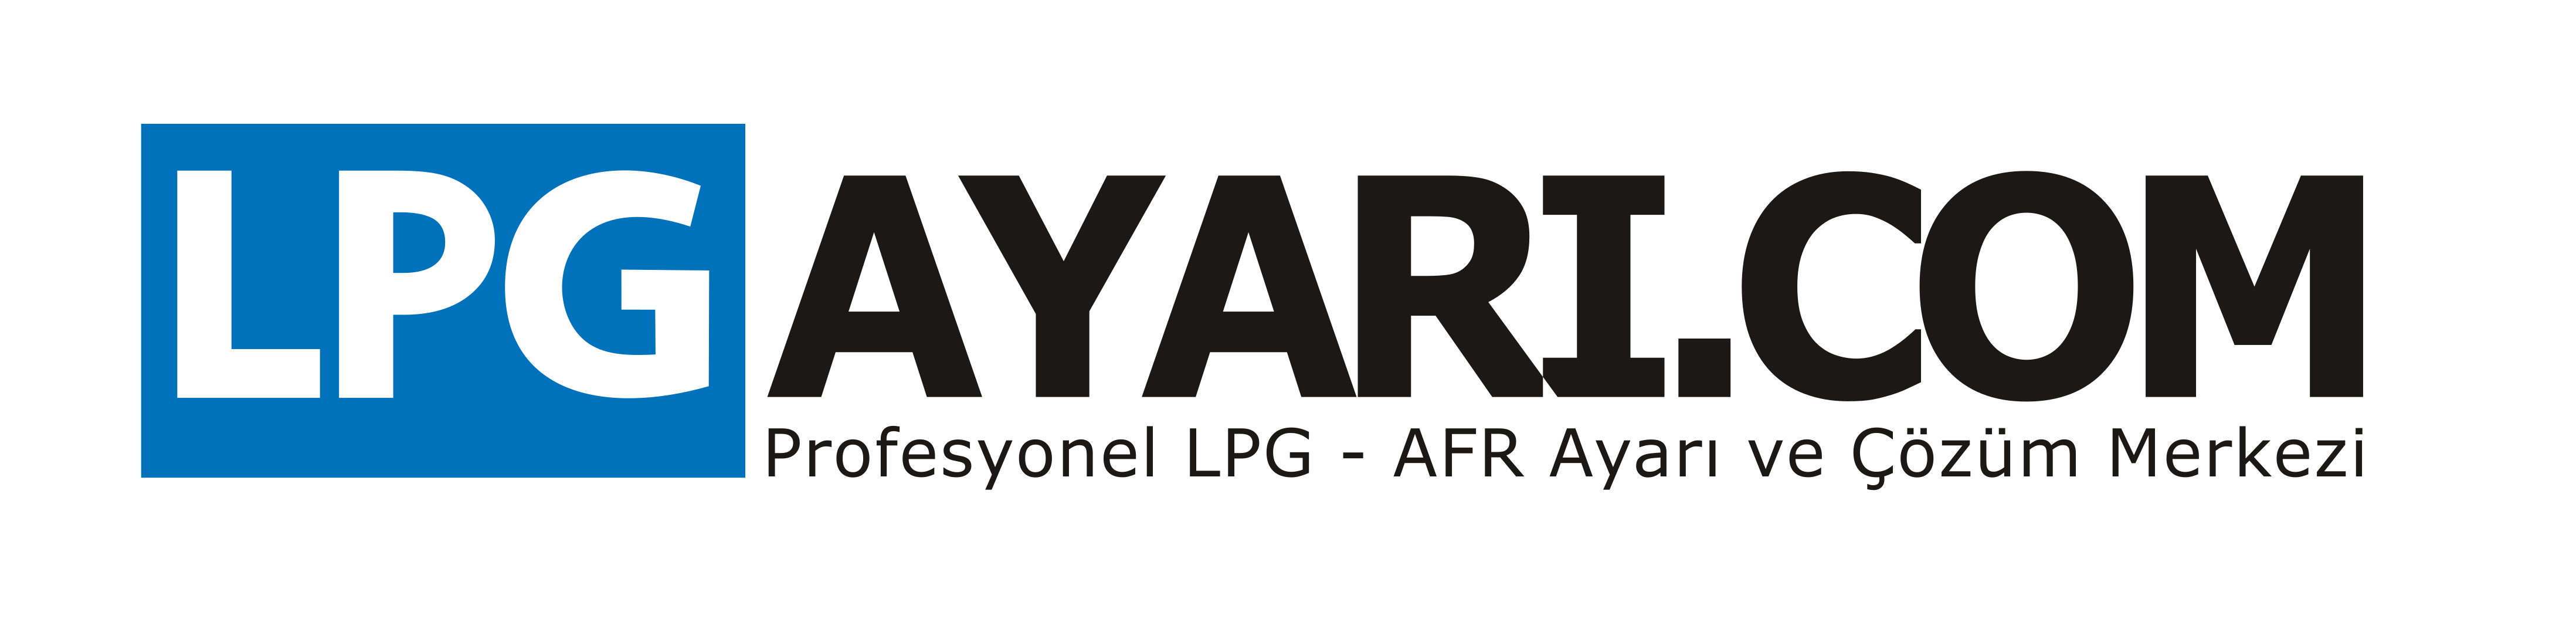 Profesyonel LPG - AFR Ayarı - LPGAYARI.COM